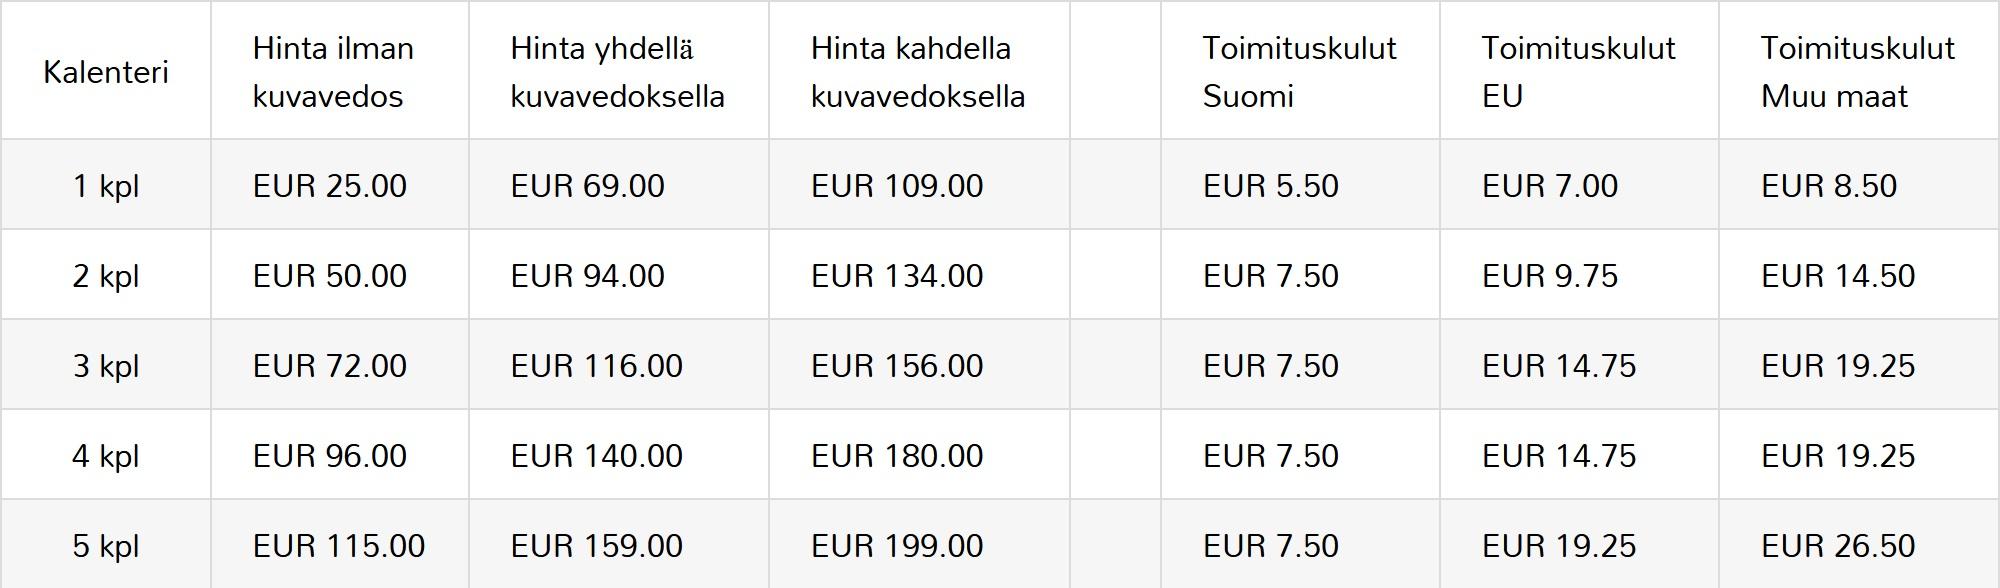 Kalenterihinnat suomeksi